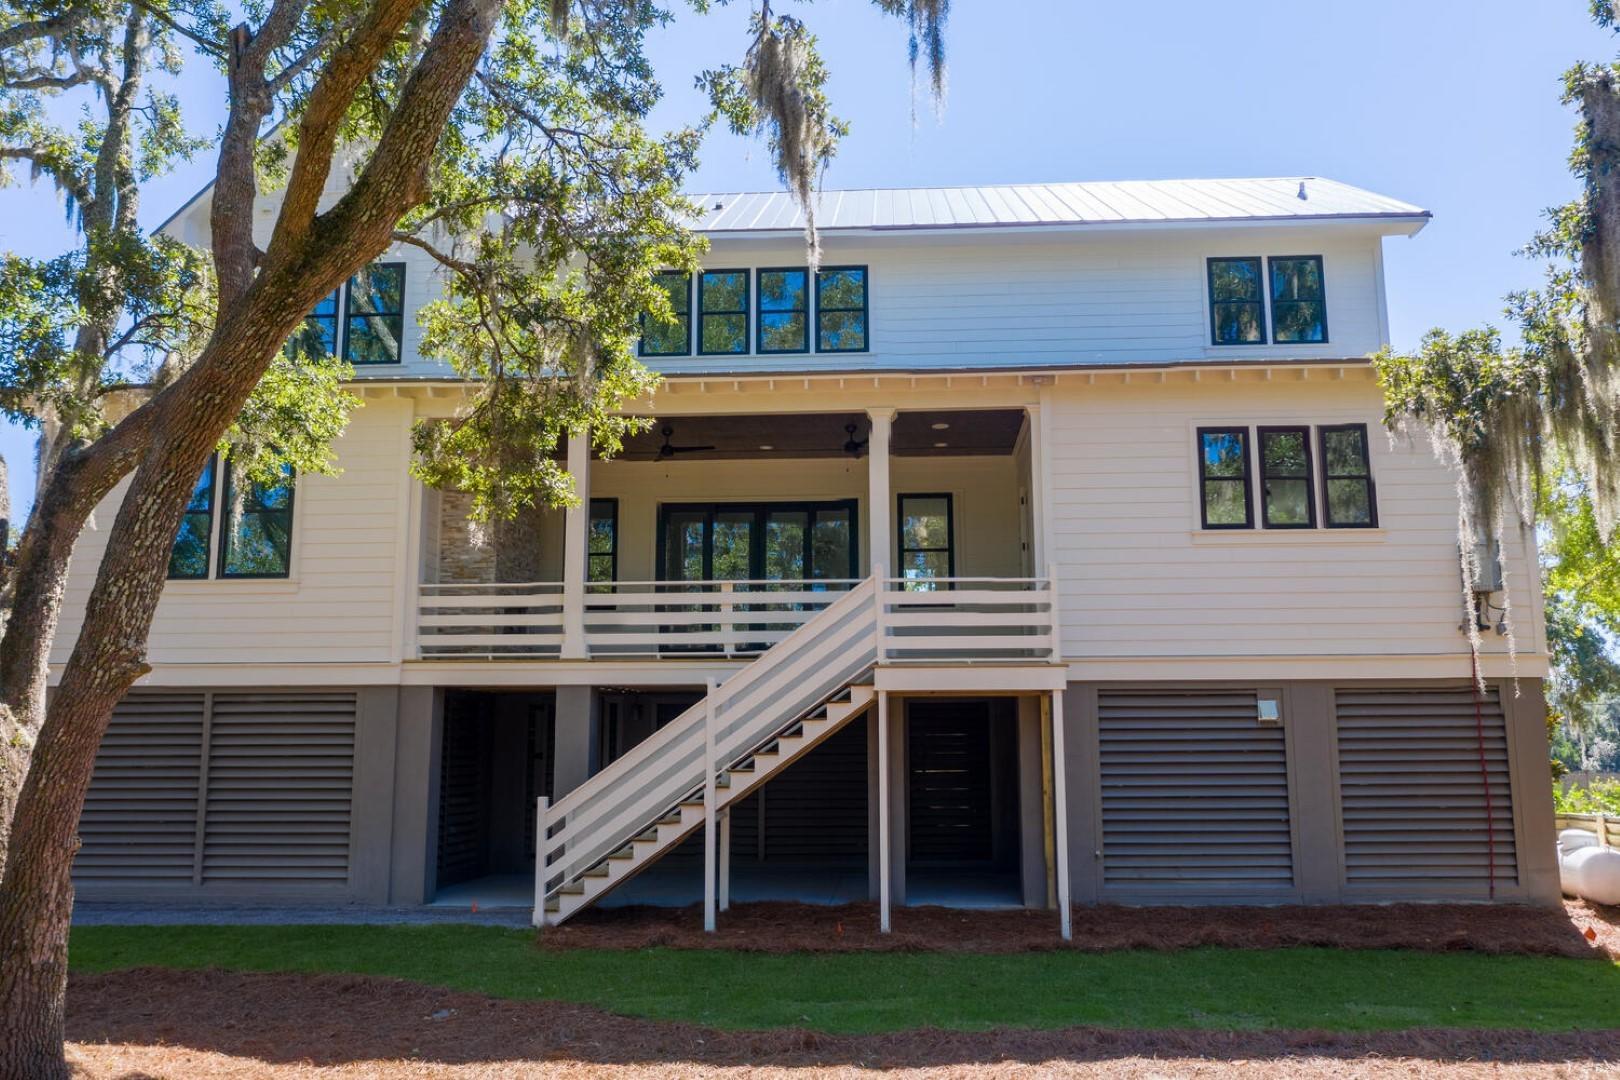 Scanlonville Homes For Sale - 156 5th, Mount Pleasant, SC - 25